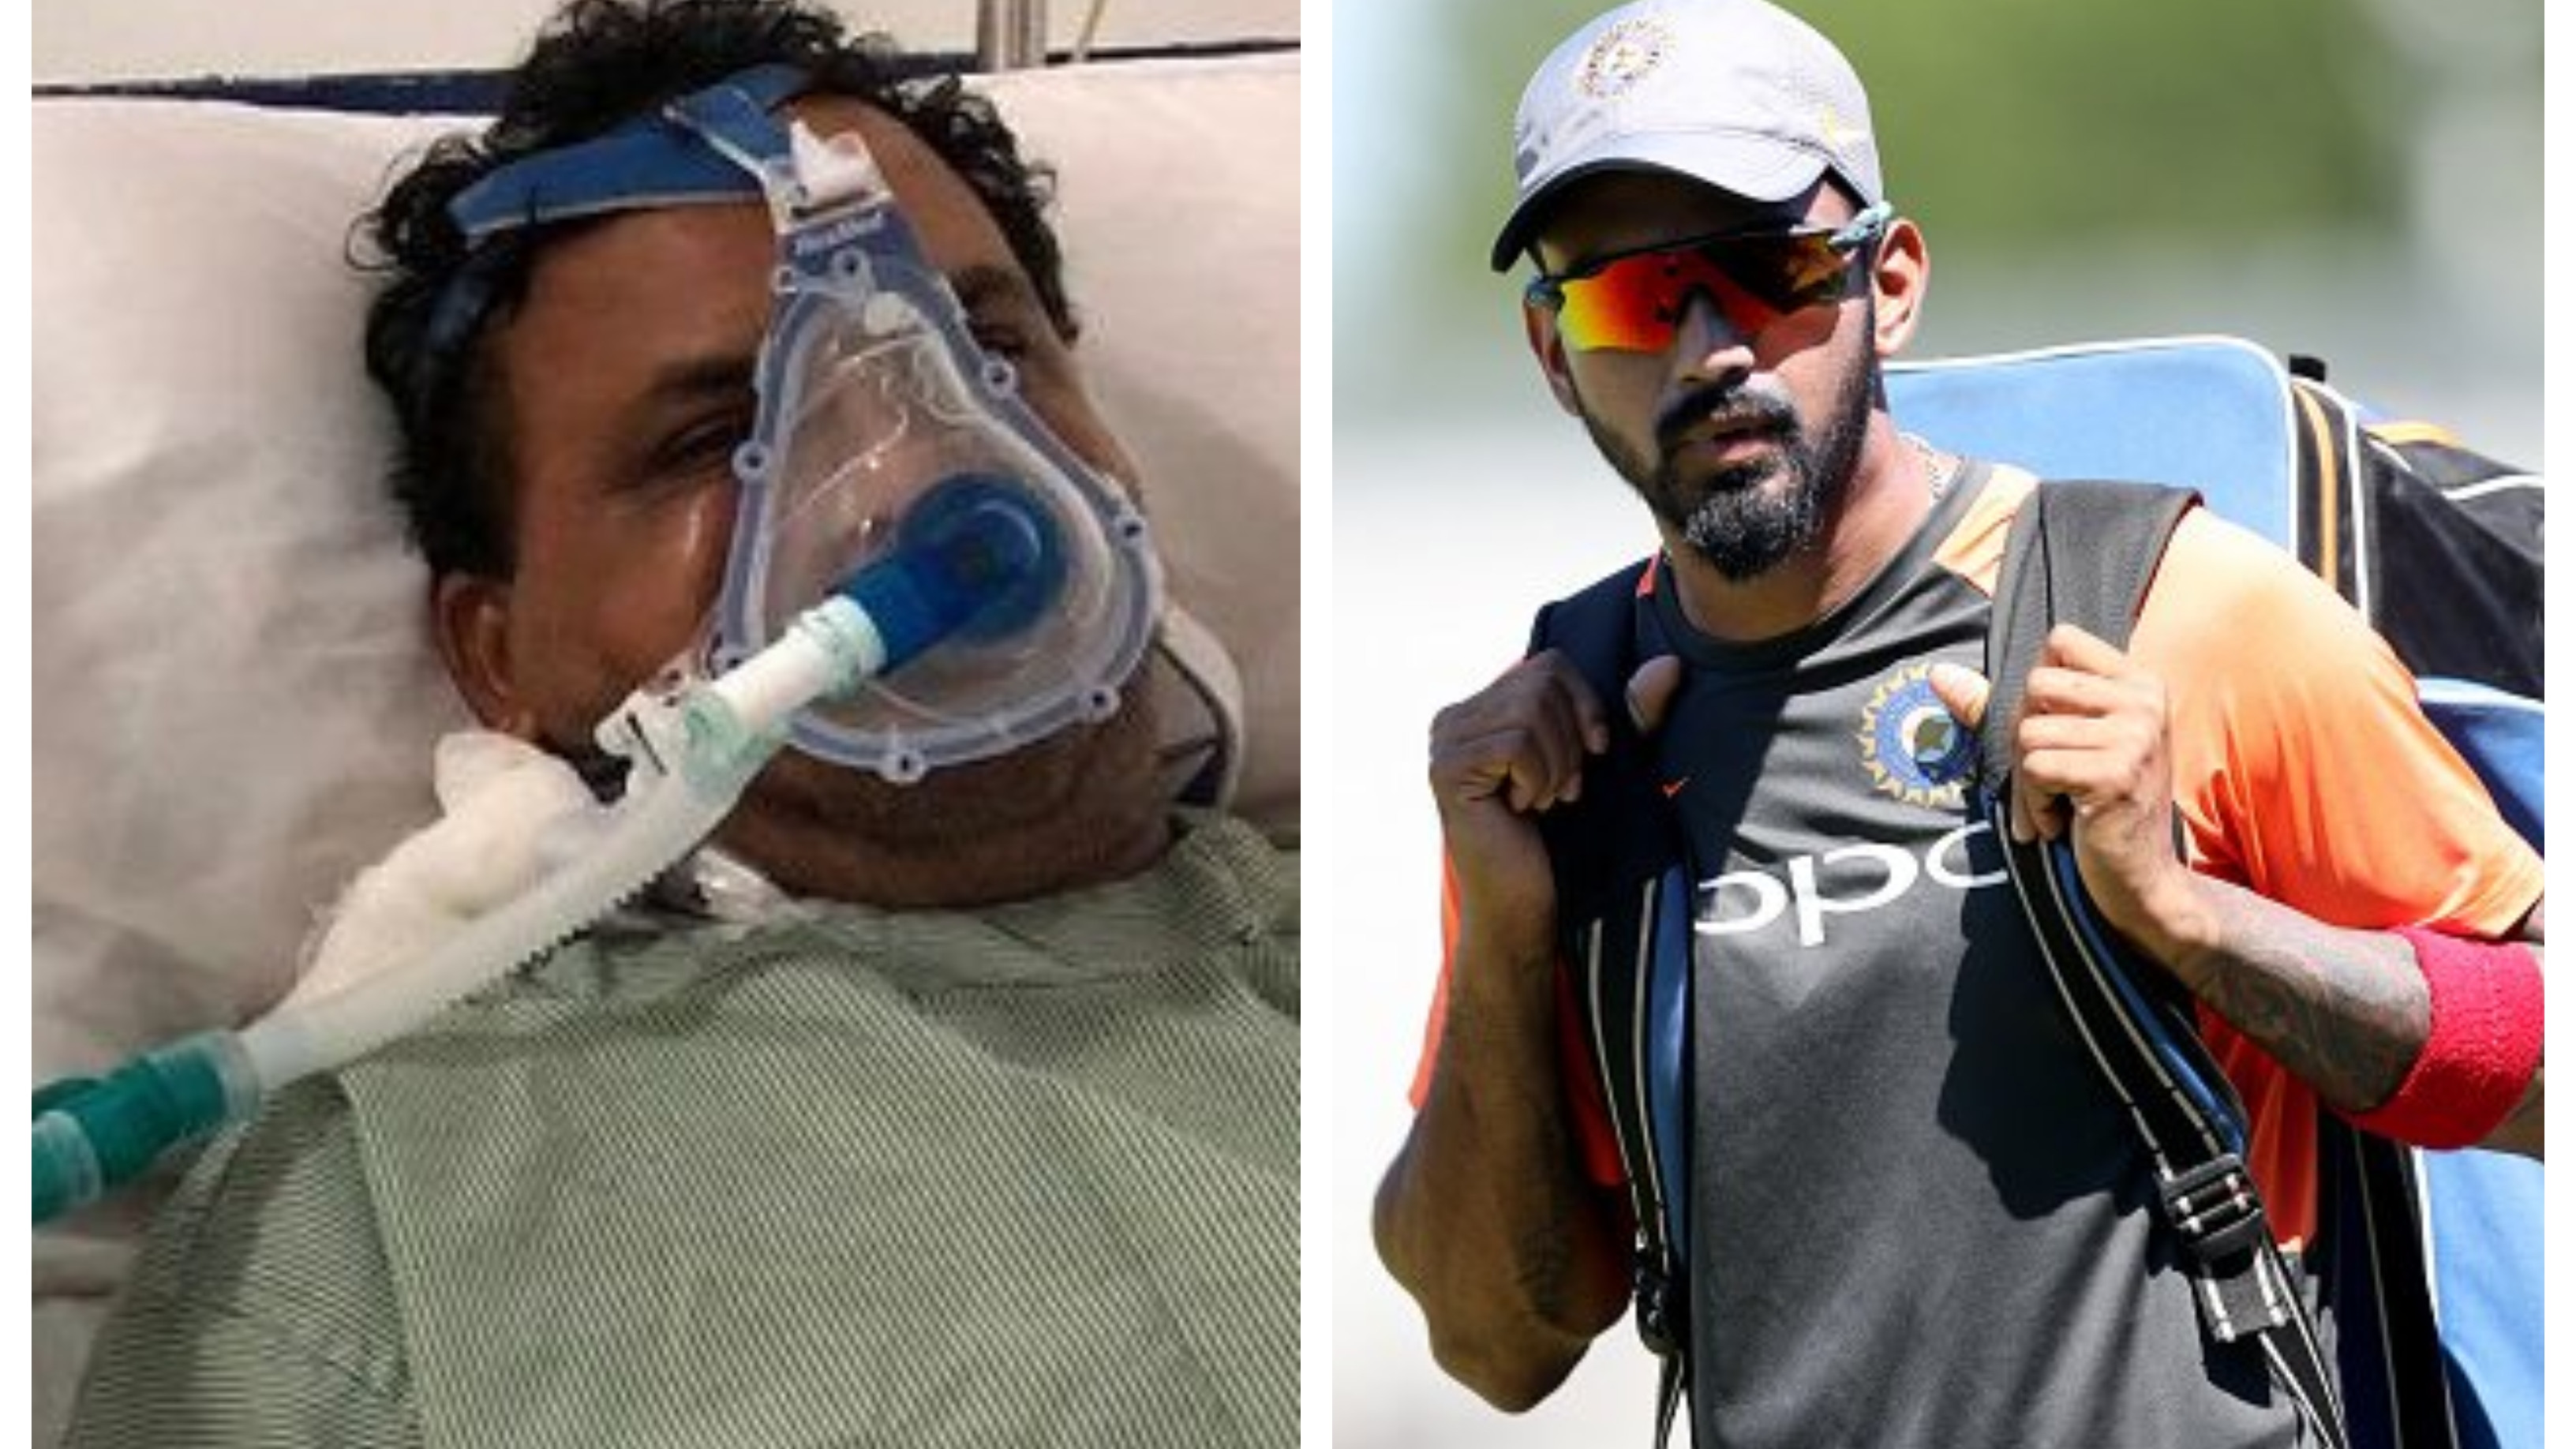 KL Rahul donates hefty sum of money to ailing Baroda cricketer Jacob Martin